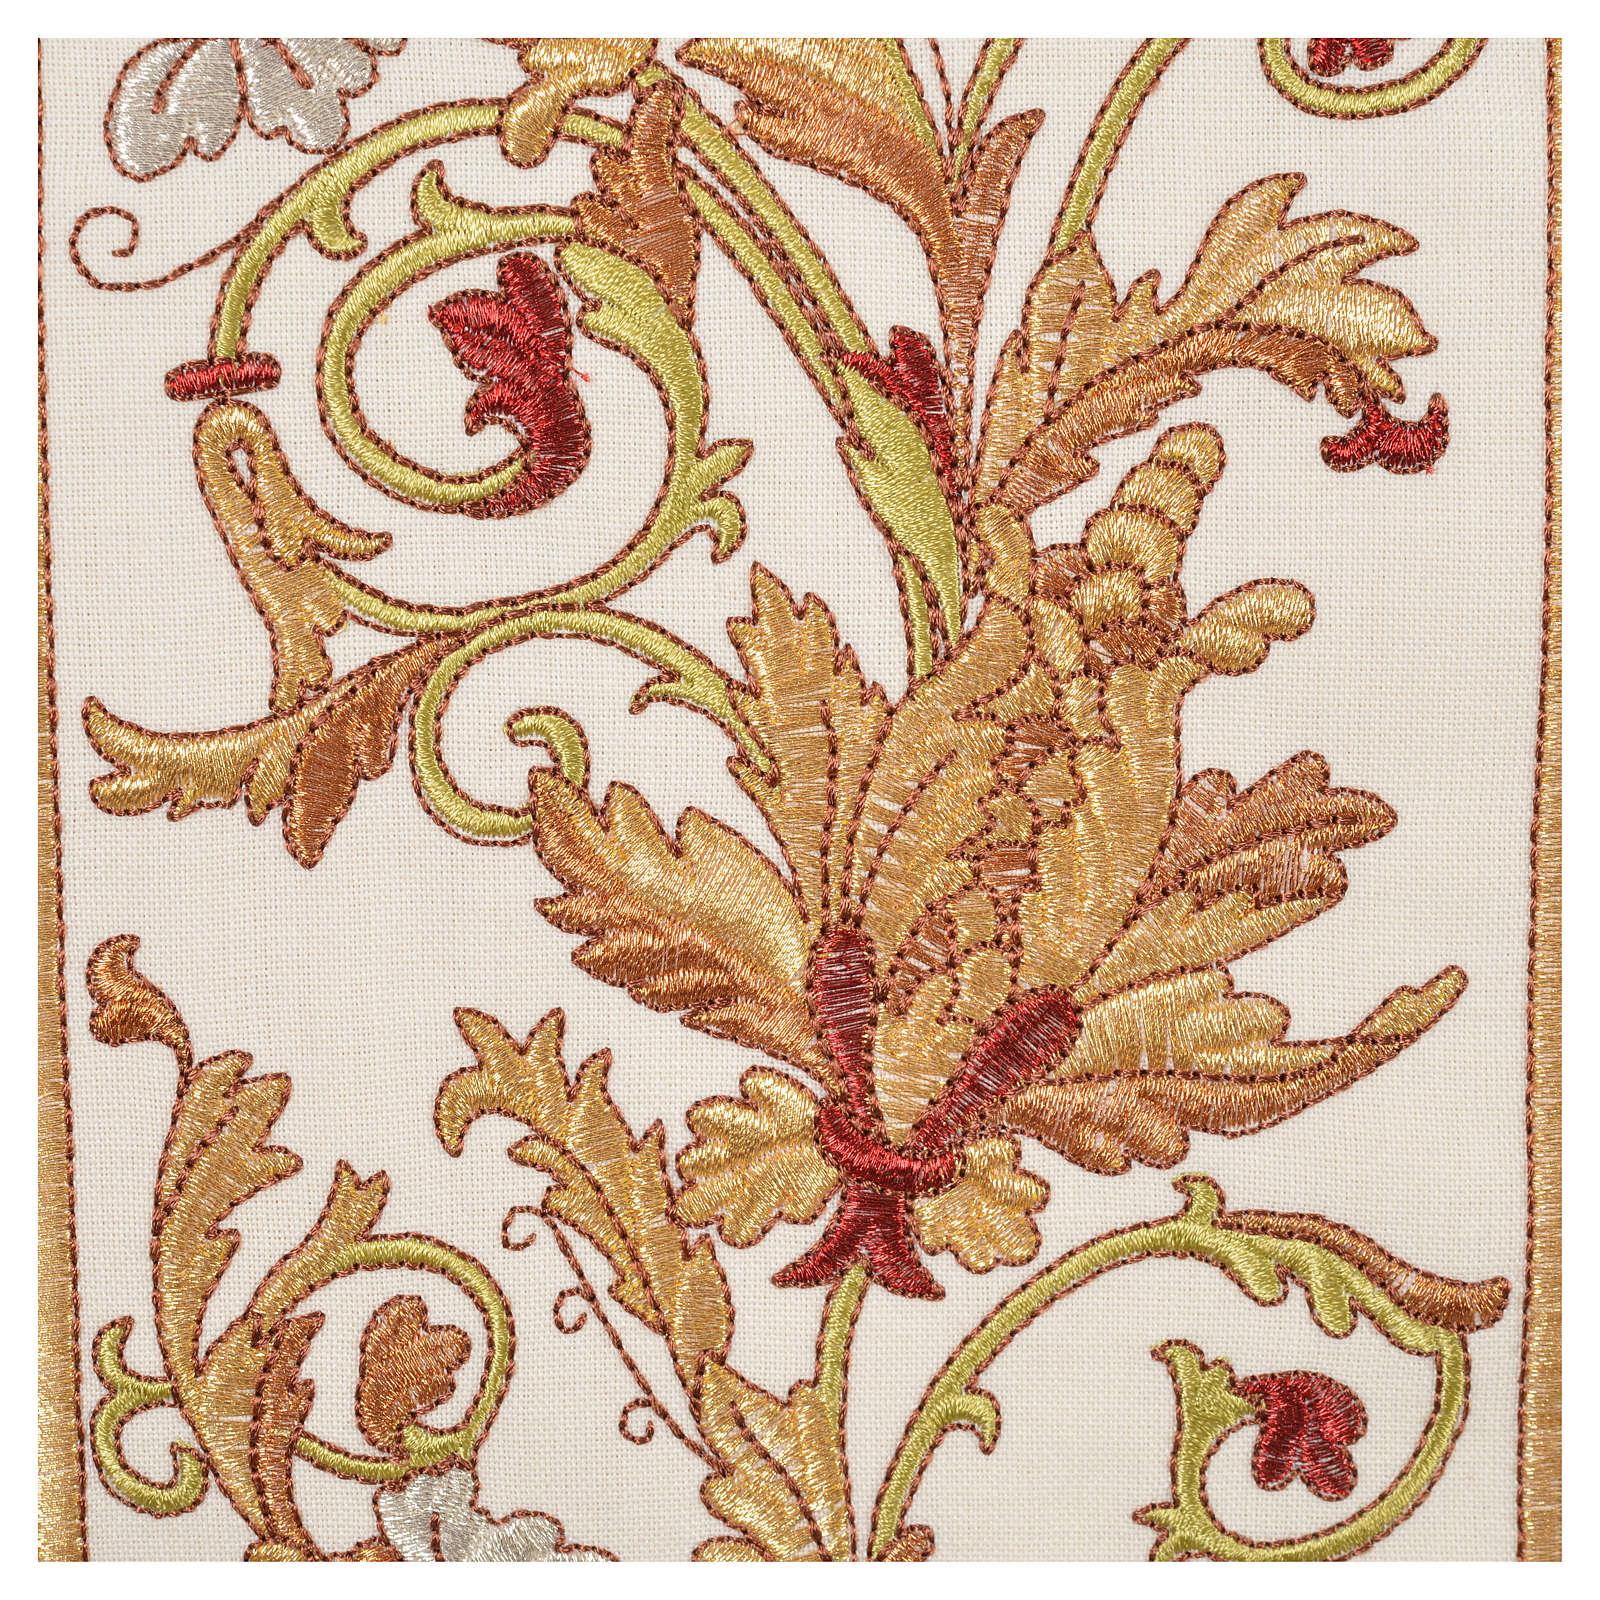 Casulla 100% lana IHS, decoraciones espigas uva 4